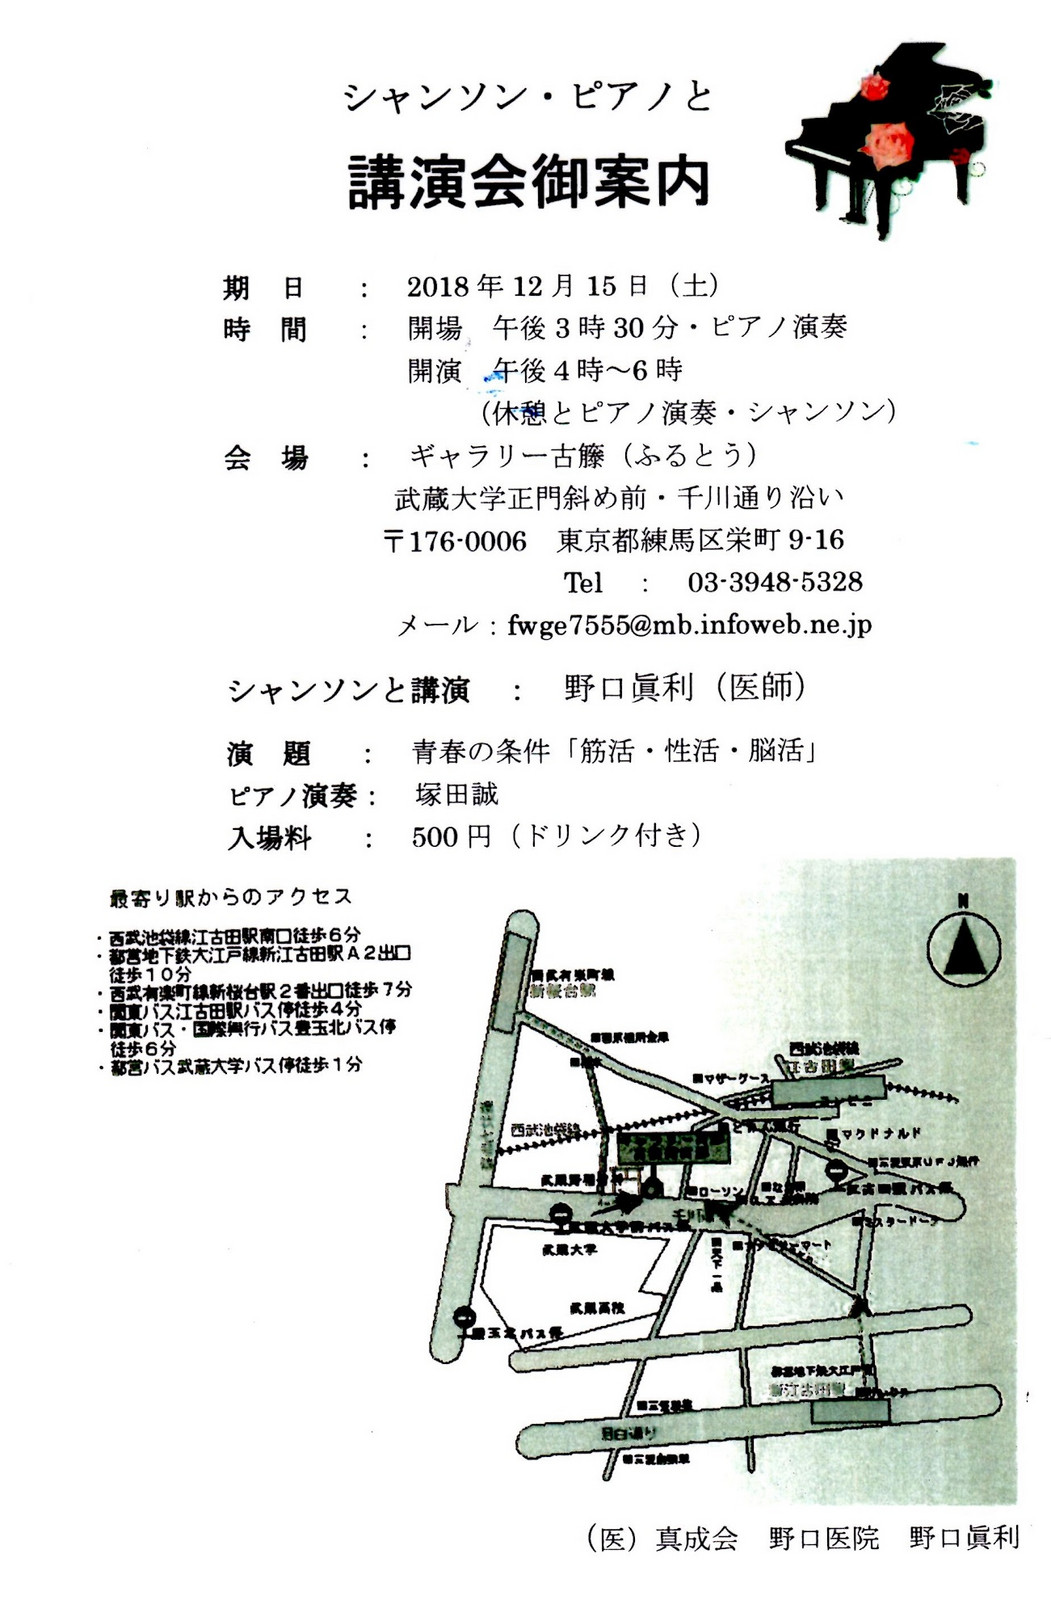 Img212_2